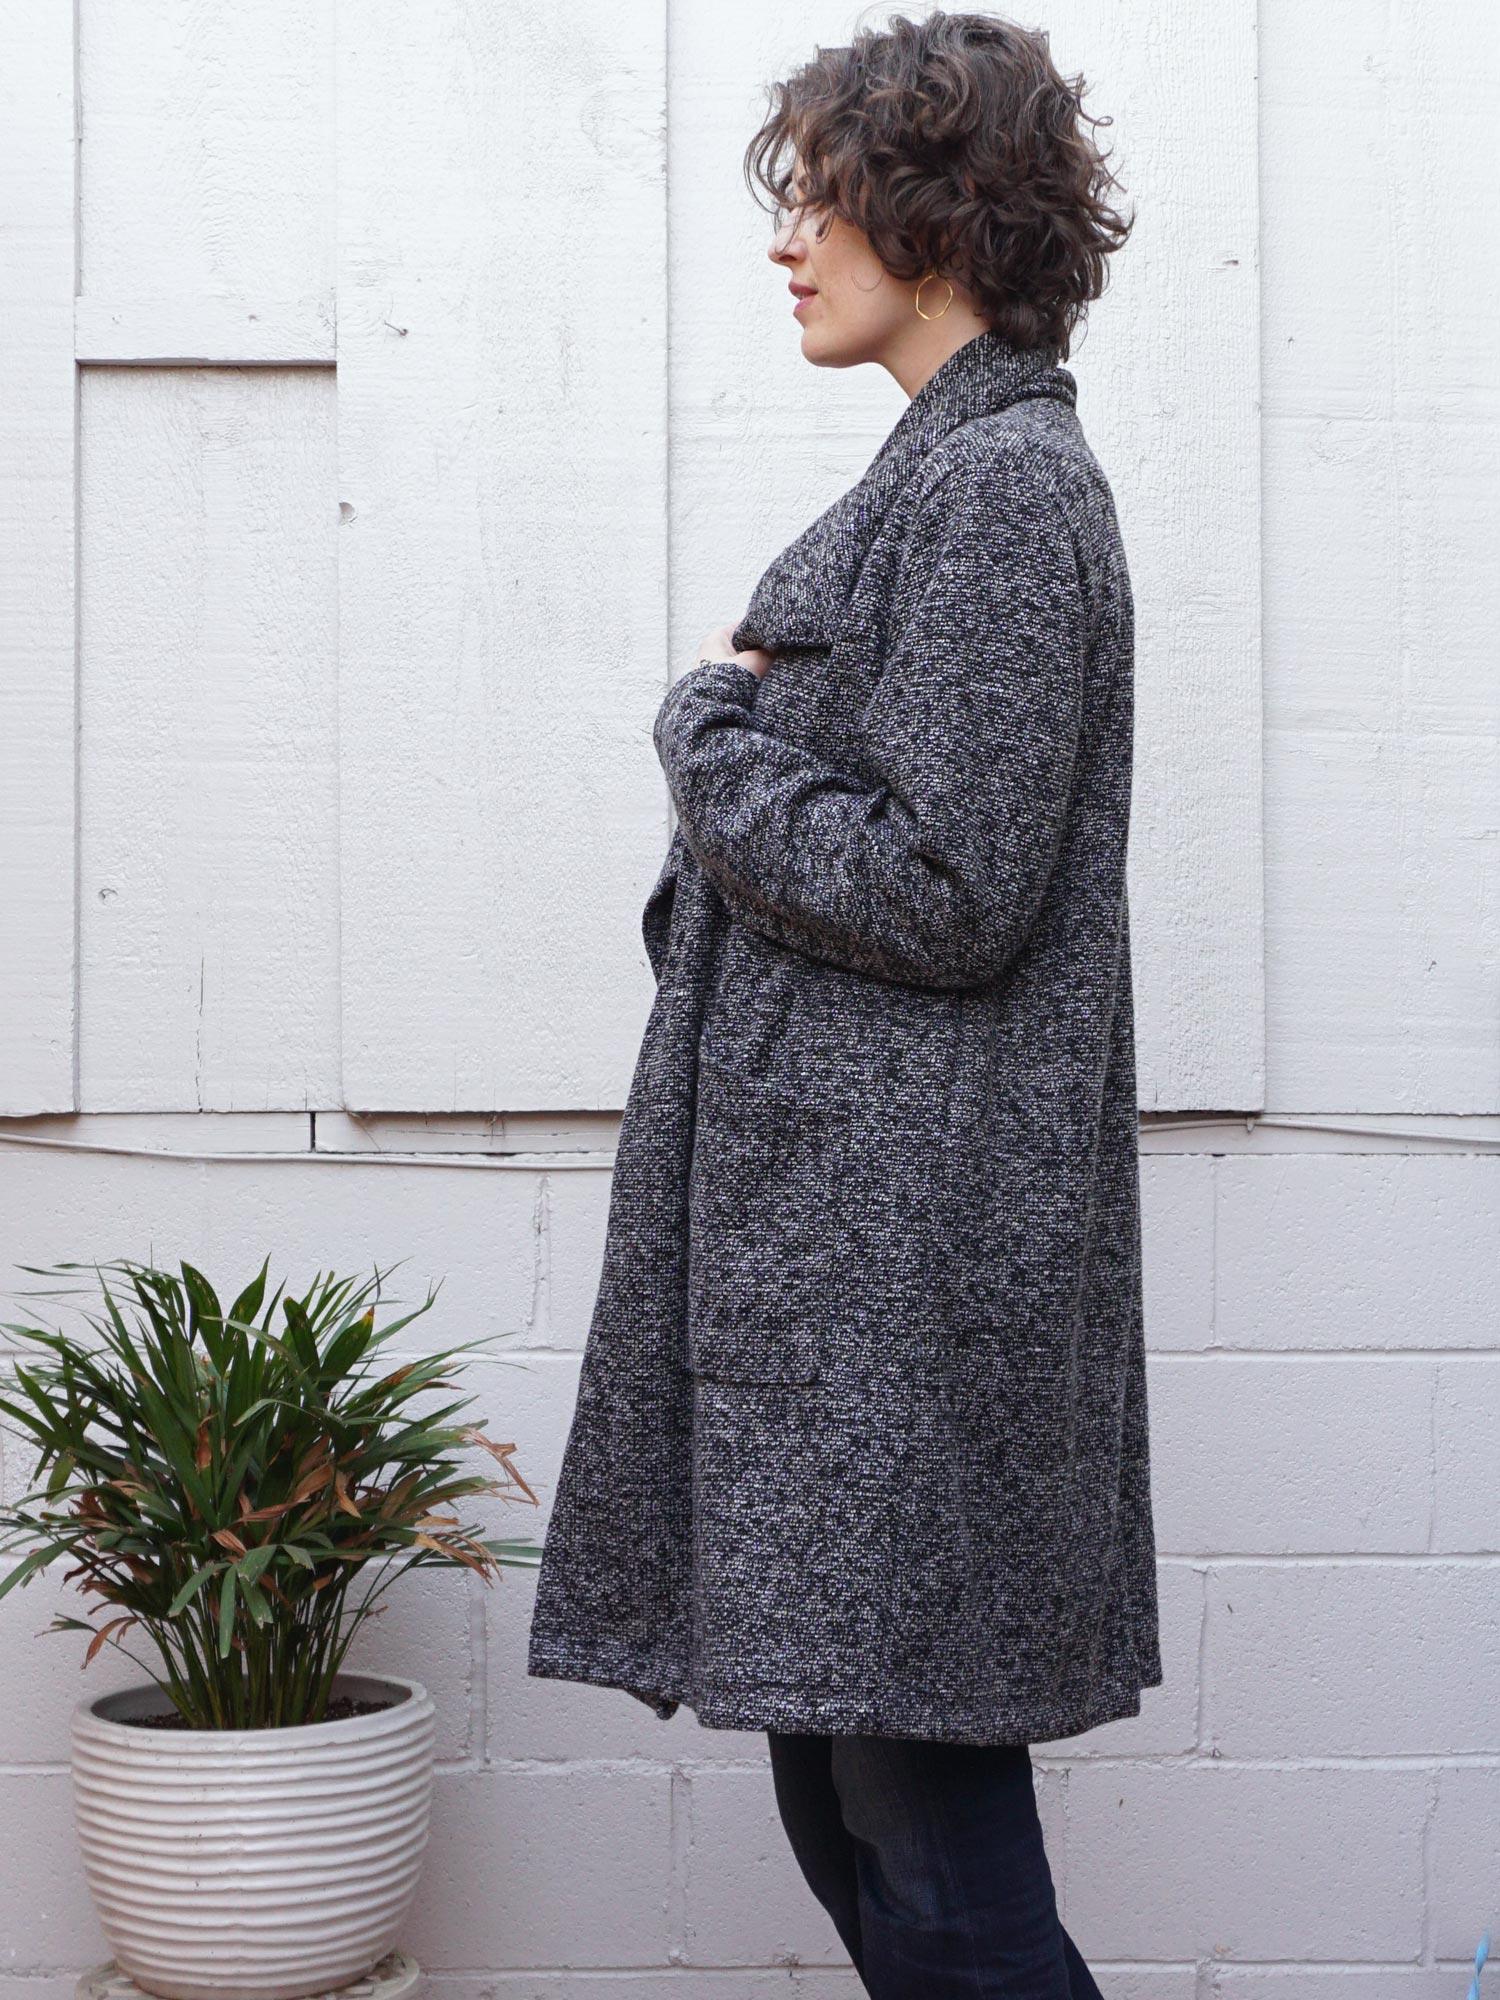 DIY Boucle Coatigan – Review of the Jill Coat by Seamwork